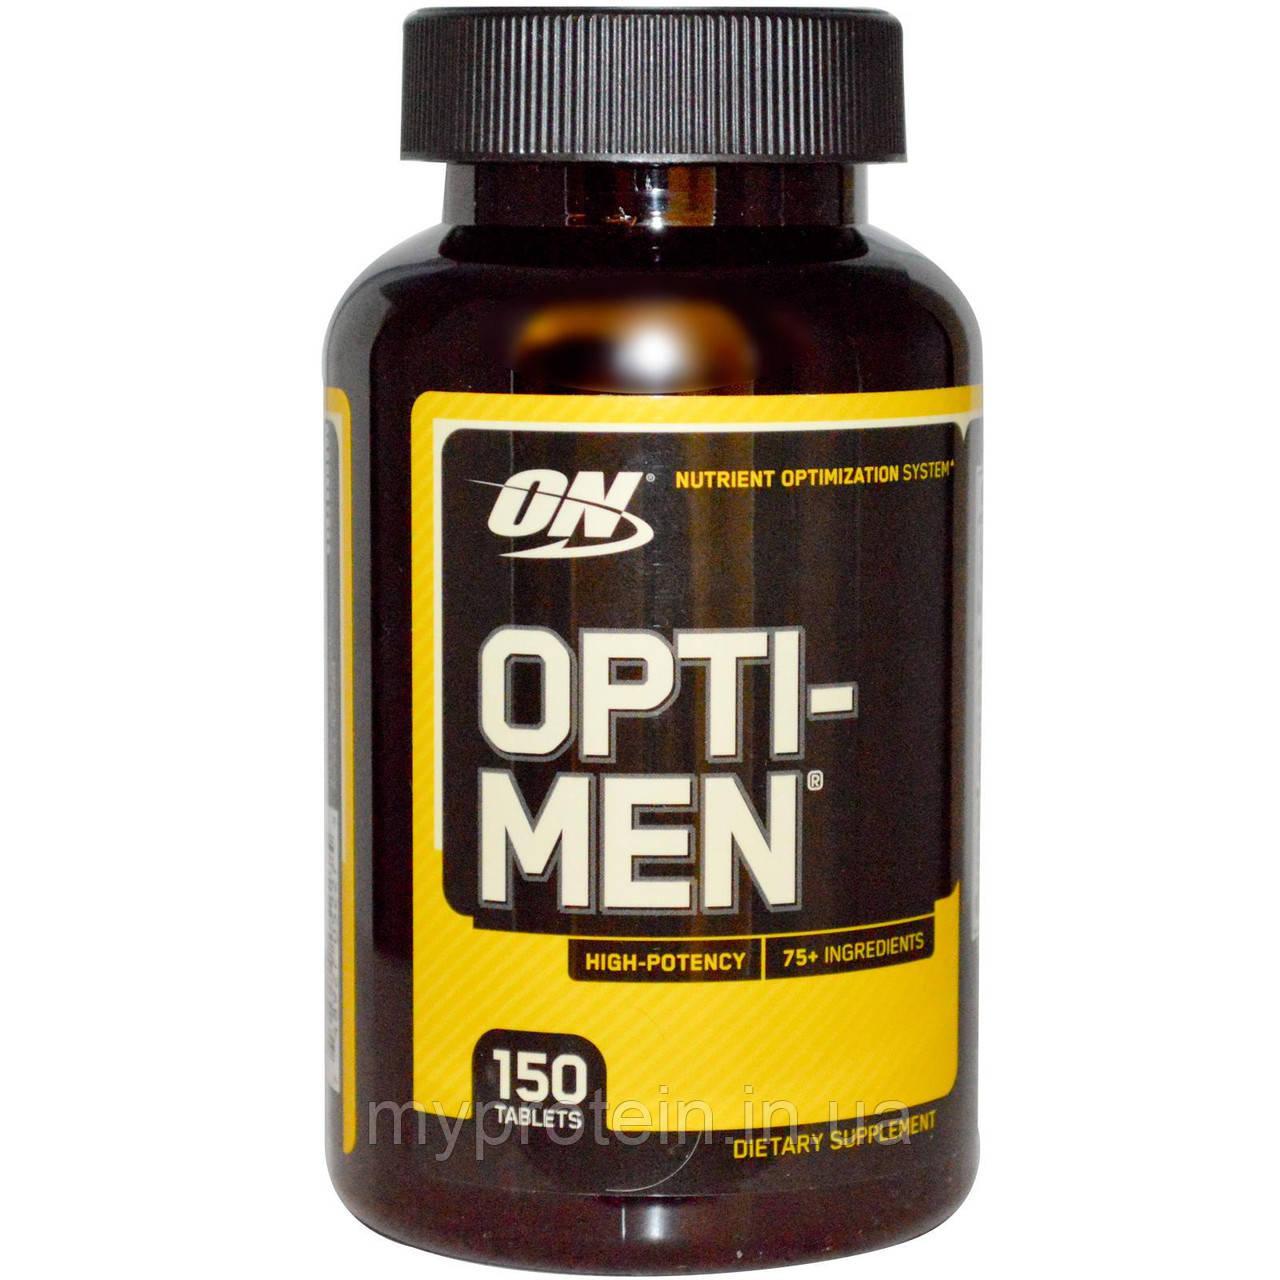 Optimum Nutrition Витамины и минералы для мужчин Опти мен Opti-Men (150 tabs) US NEW!, цена 590,25 грн., купить в Киеве — Prom.ua (ID#286106561)